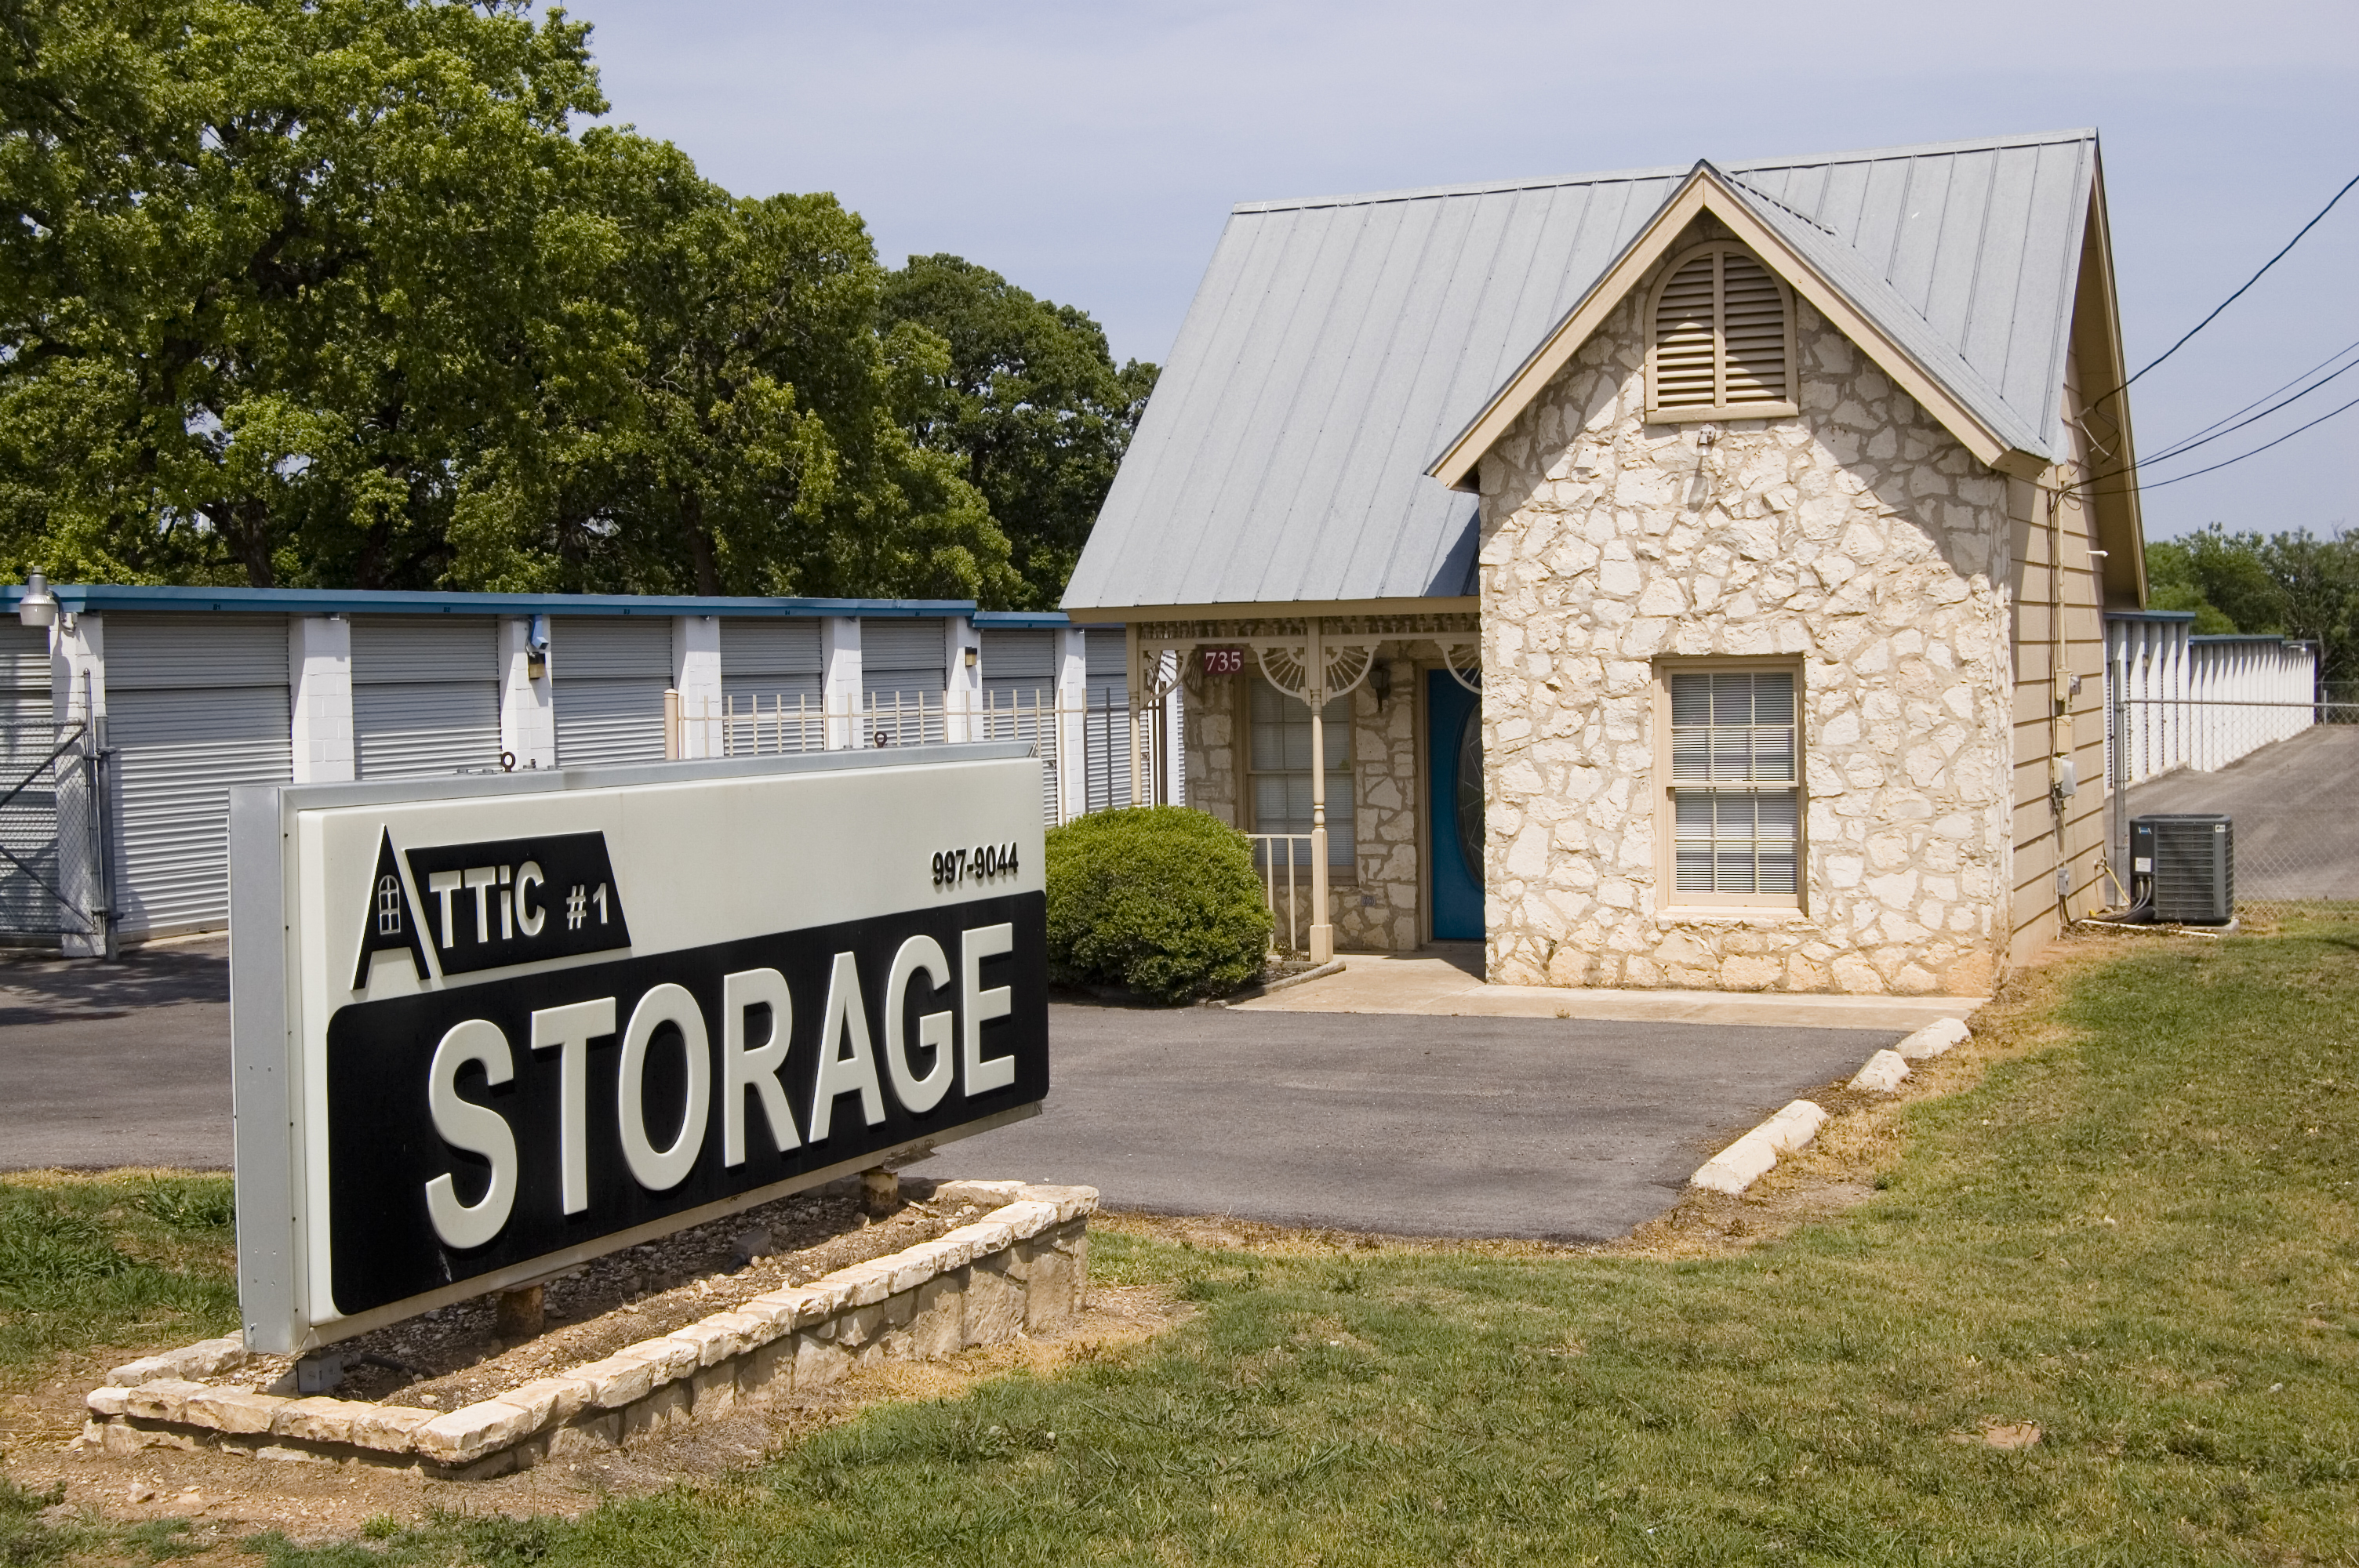 Attic Storage #1